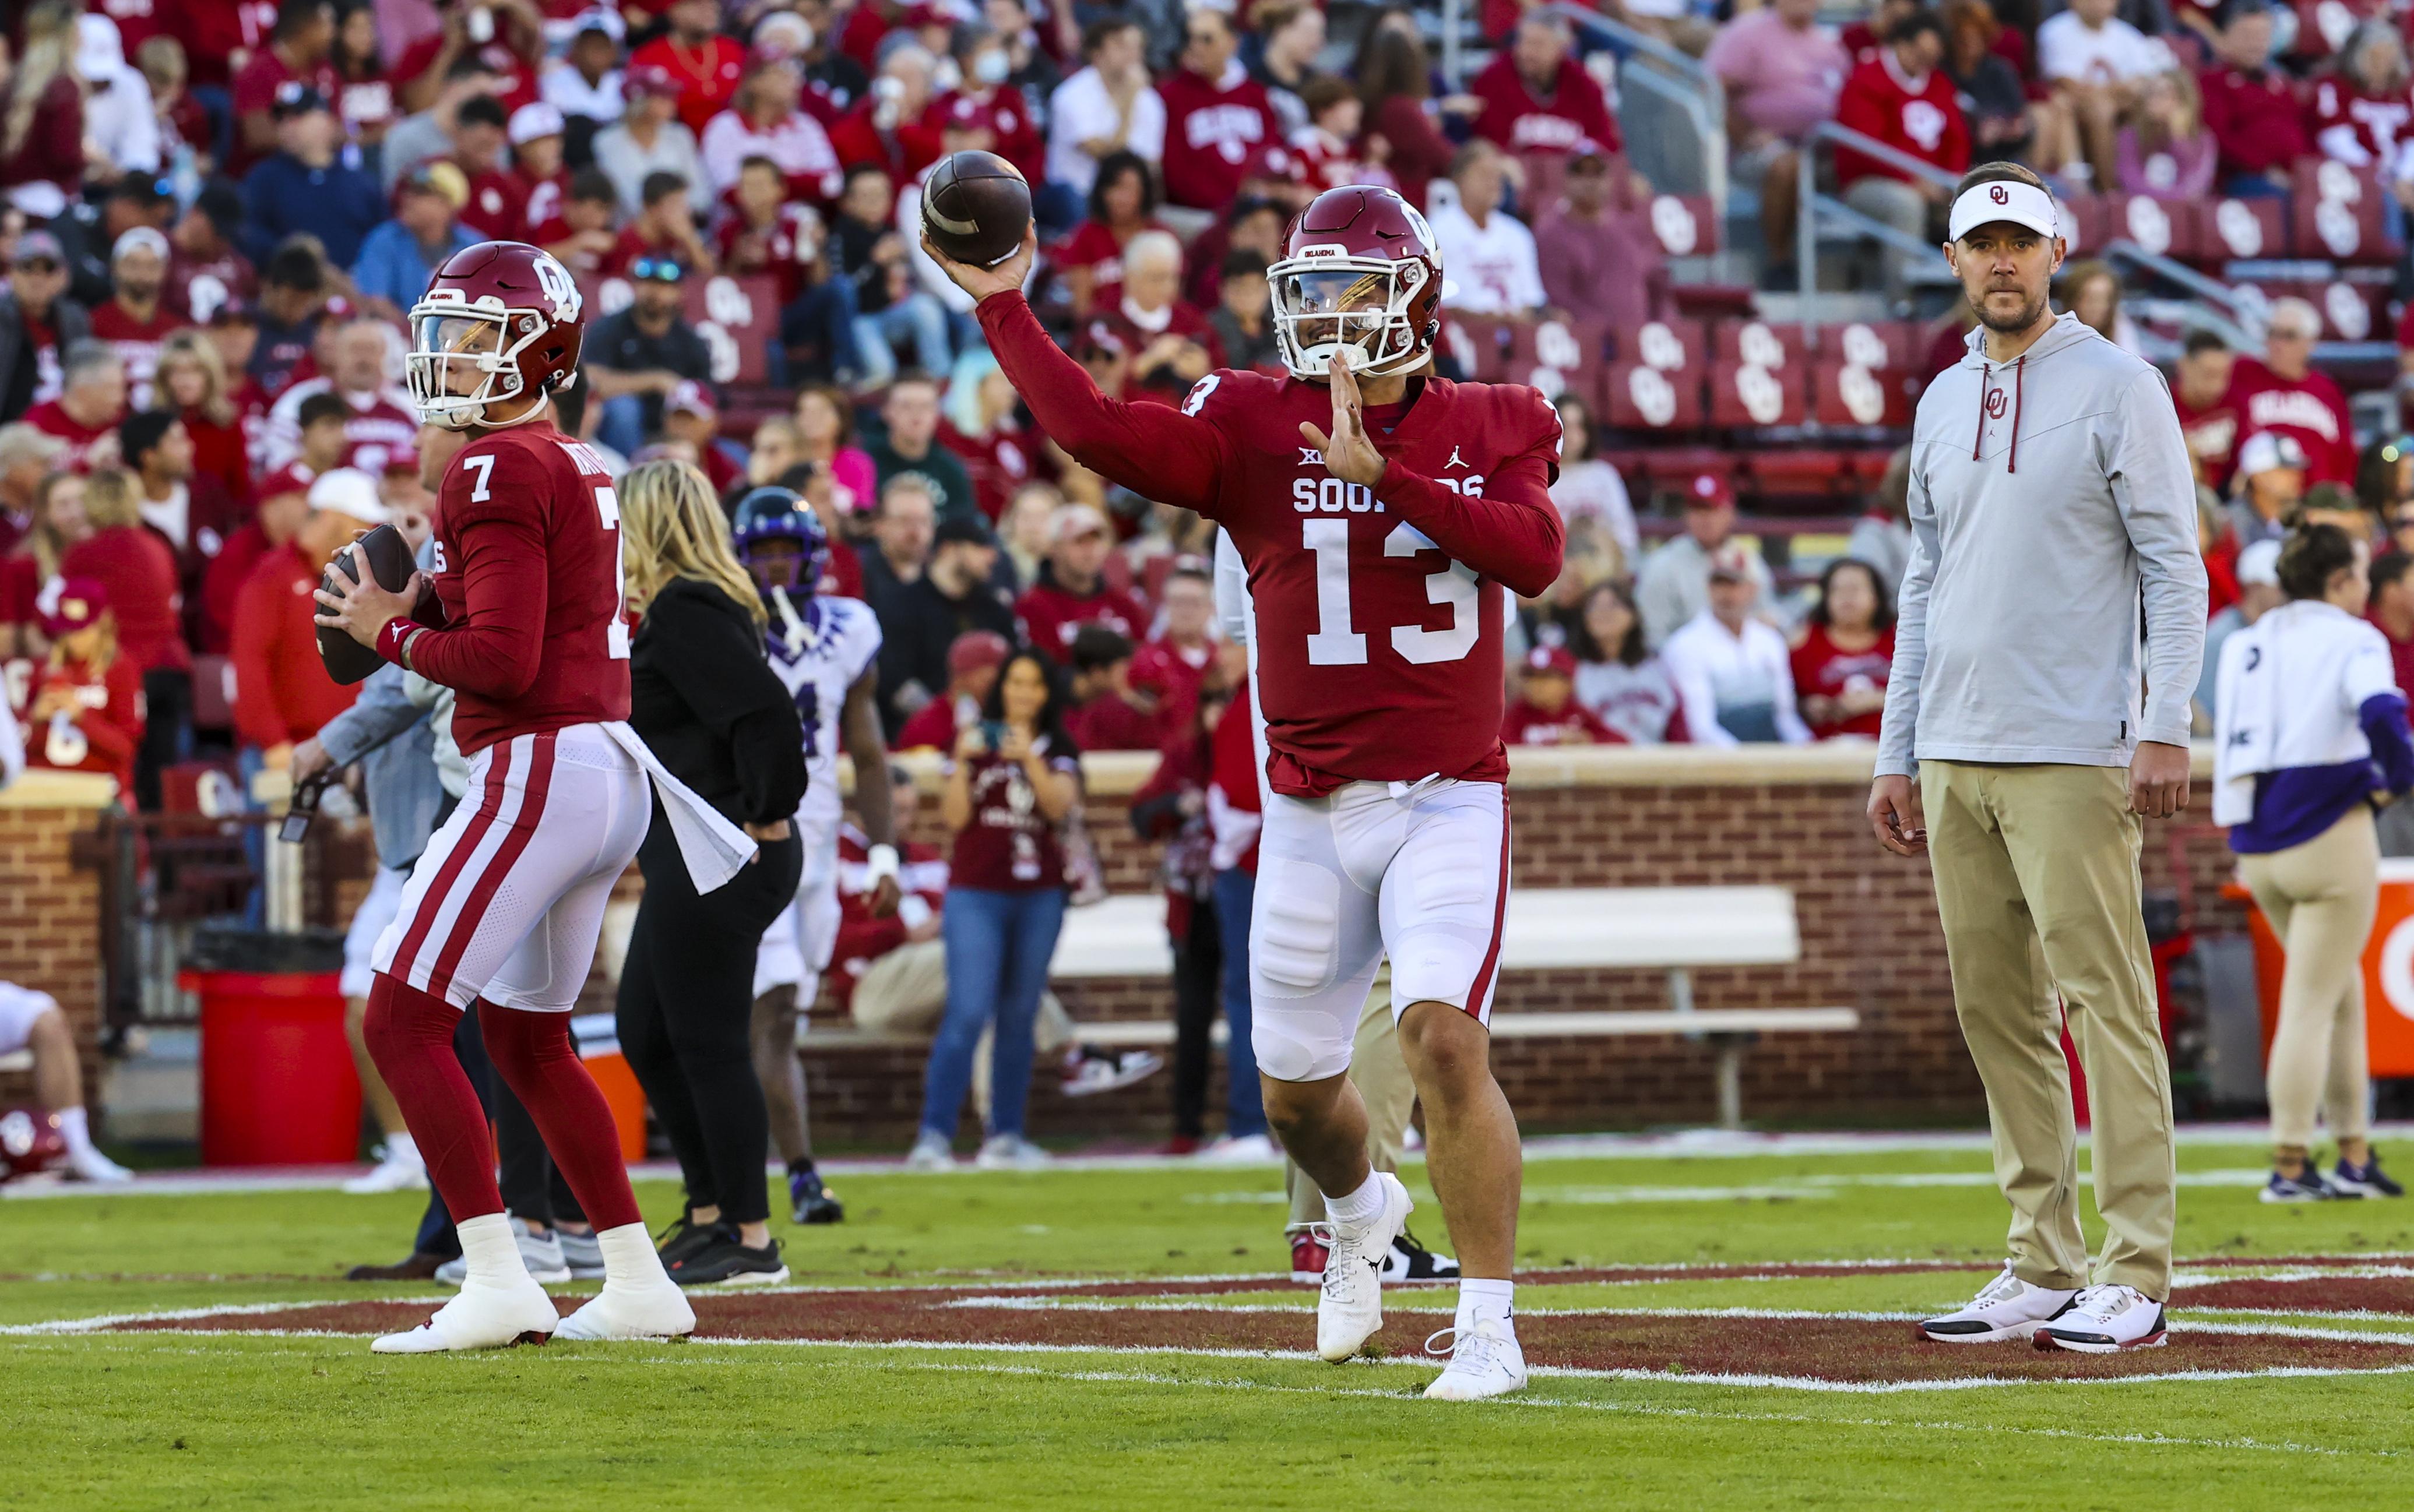 NCAA Football: Texas Christian at Oklahoma